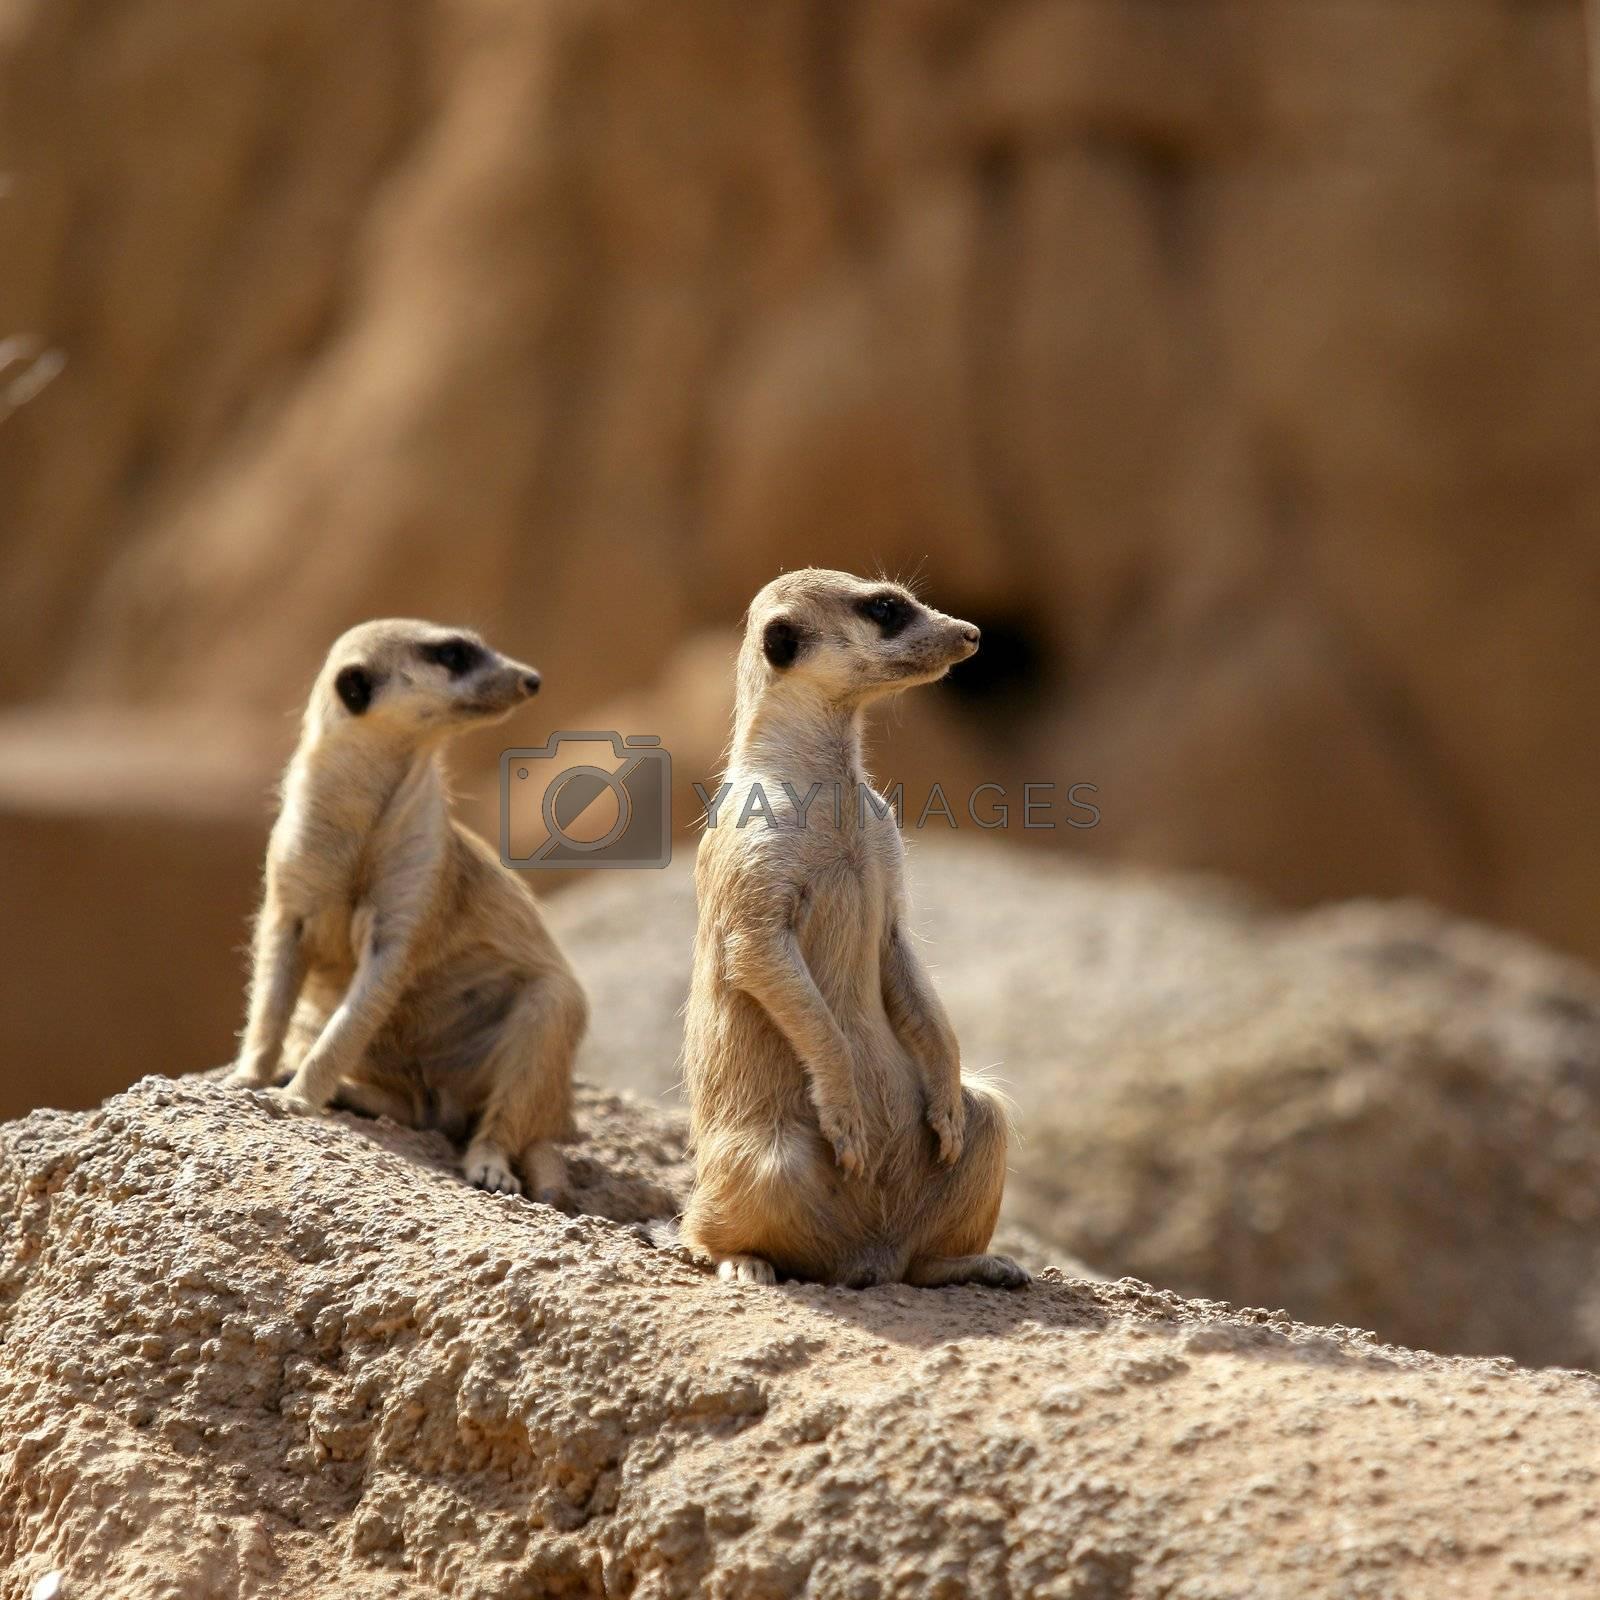 Royalty free image of Two suricata standing alert. by lunamarina